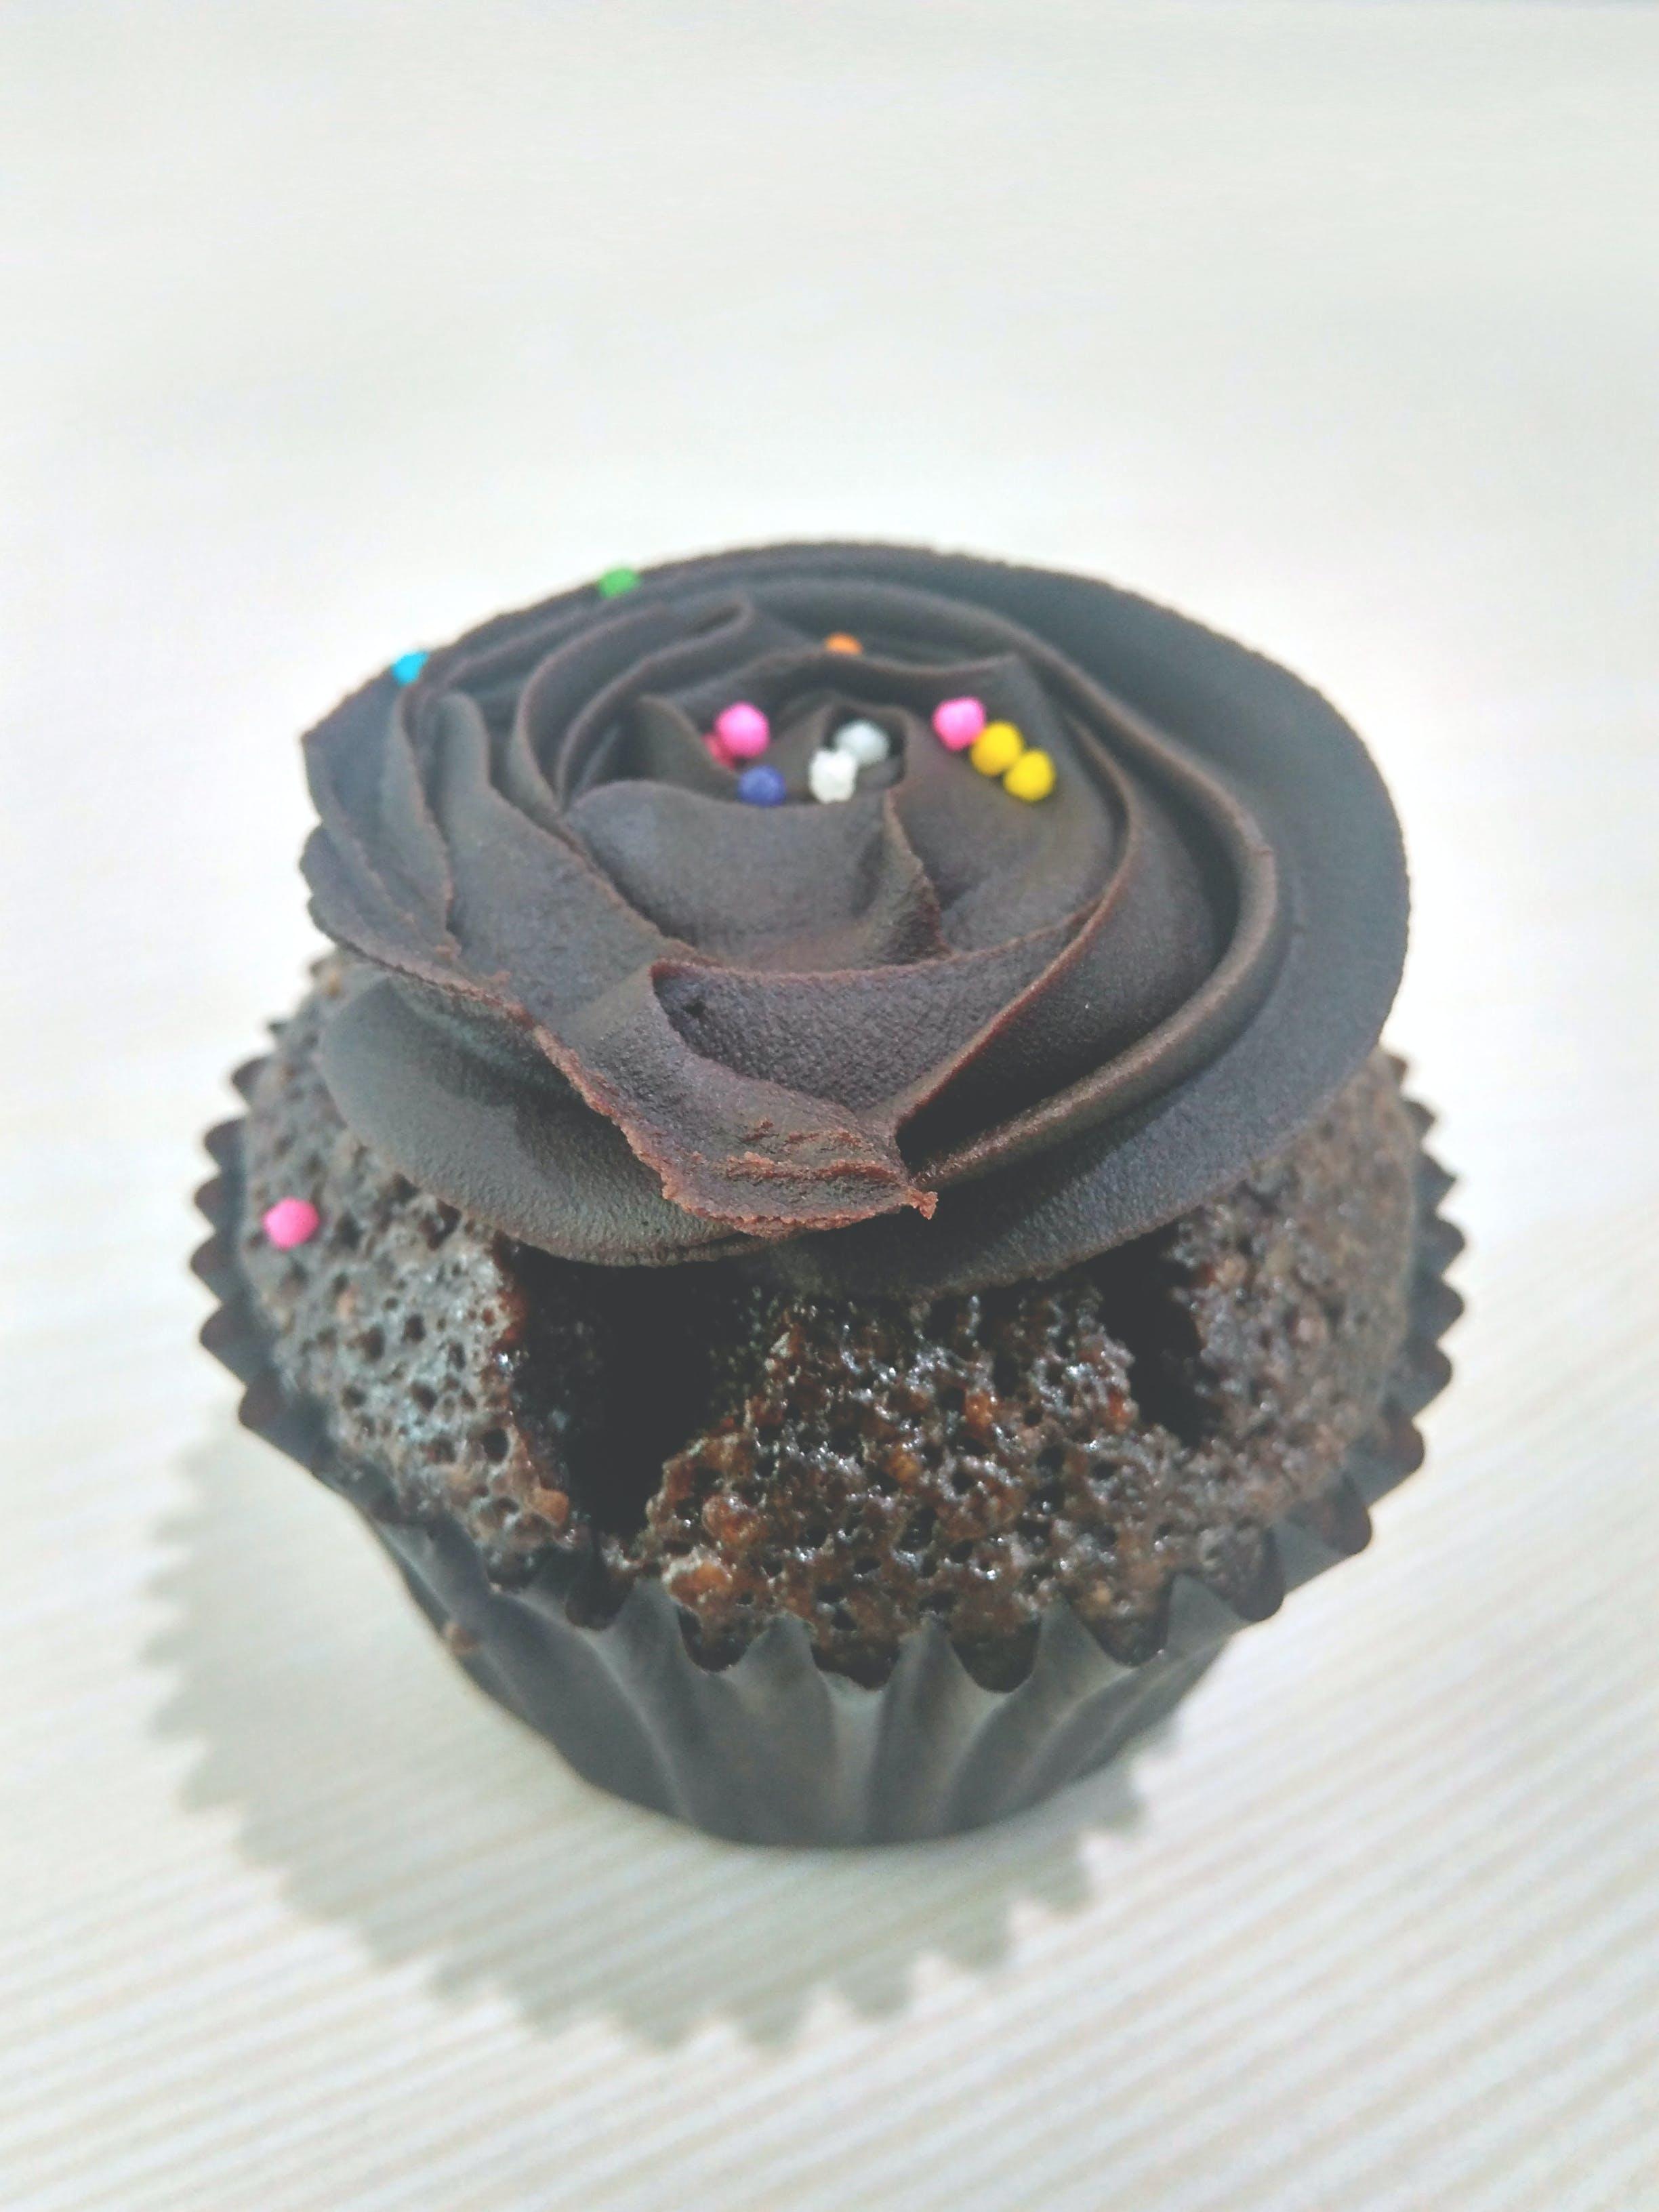 Free stock photo of cake, chocolate, chocolate cupcakes, chocolate muffin